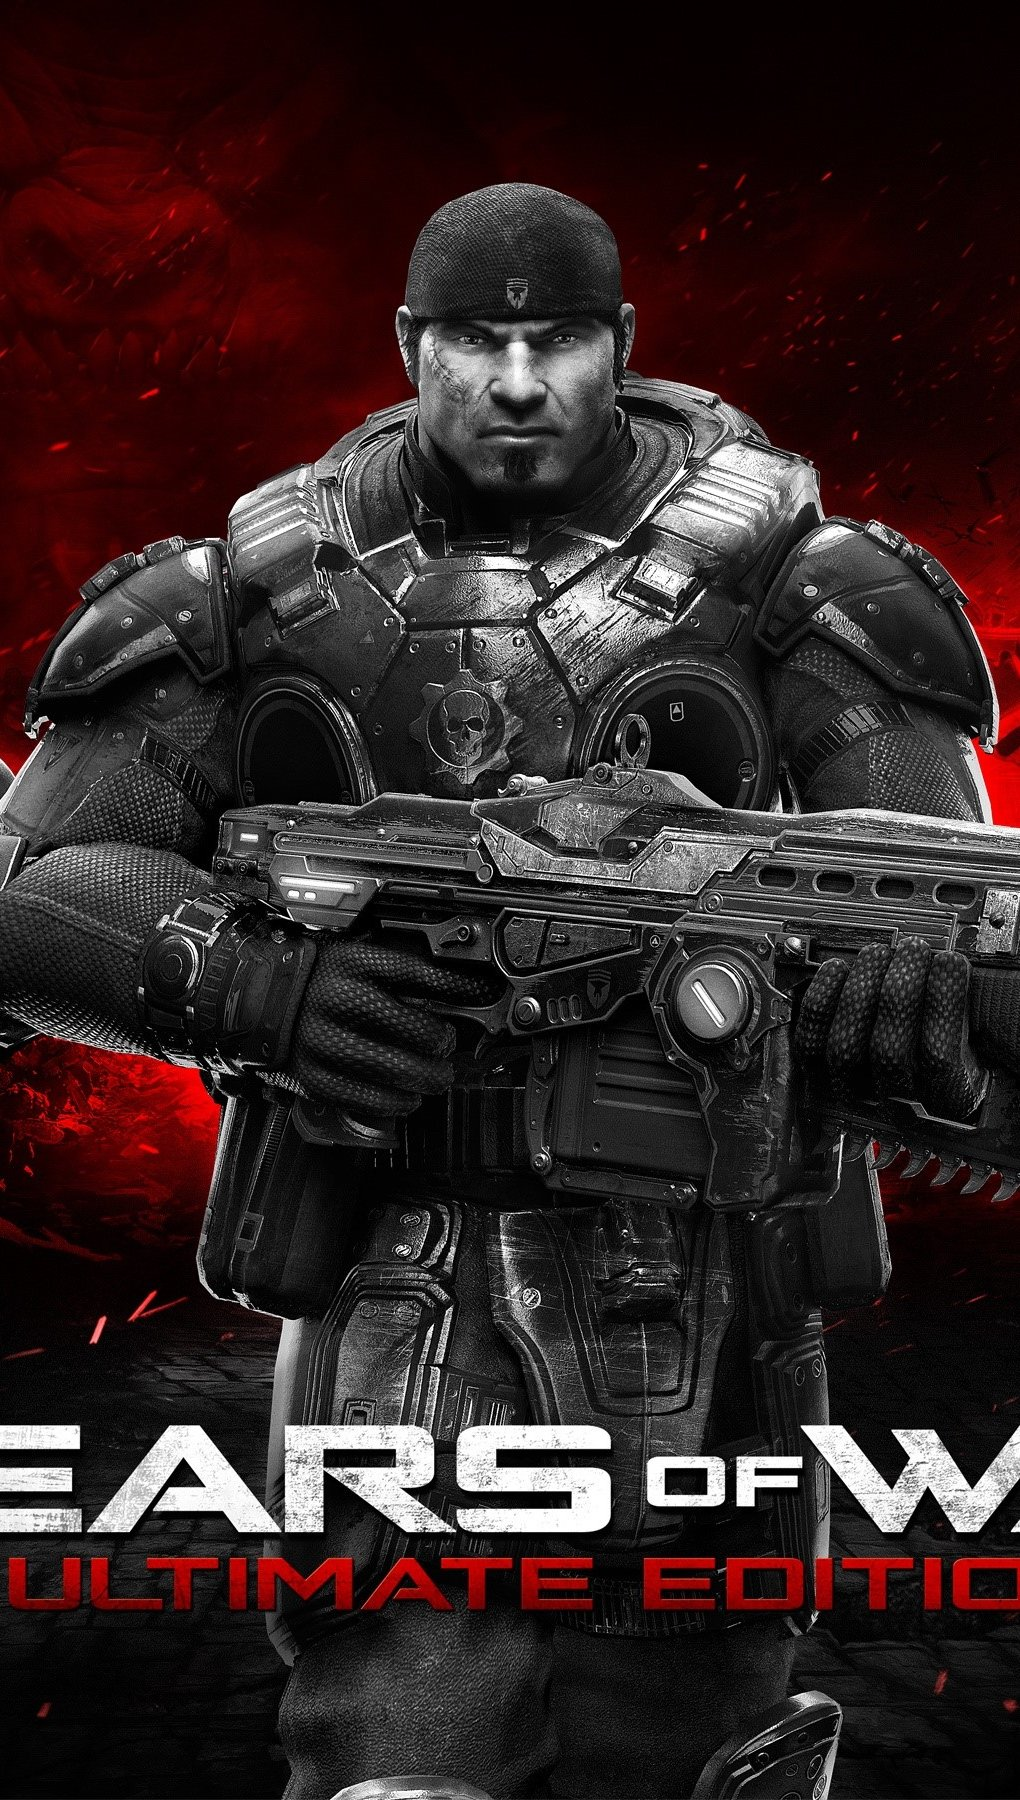 Wallpaper Gears Of War Ultimate Edition Vertical